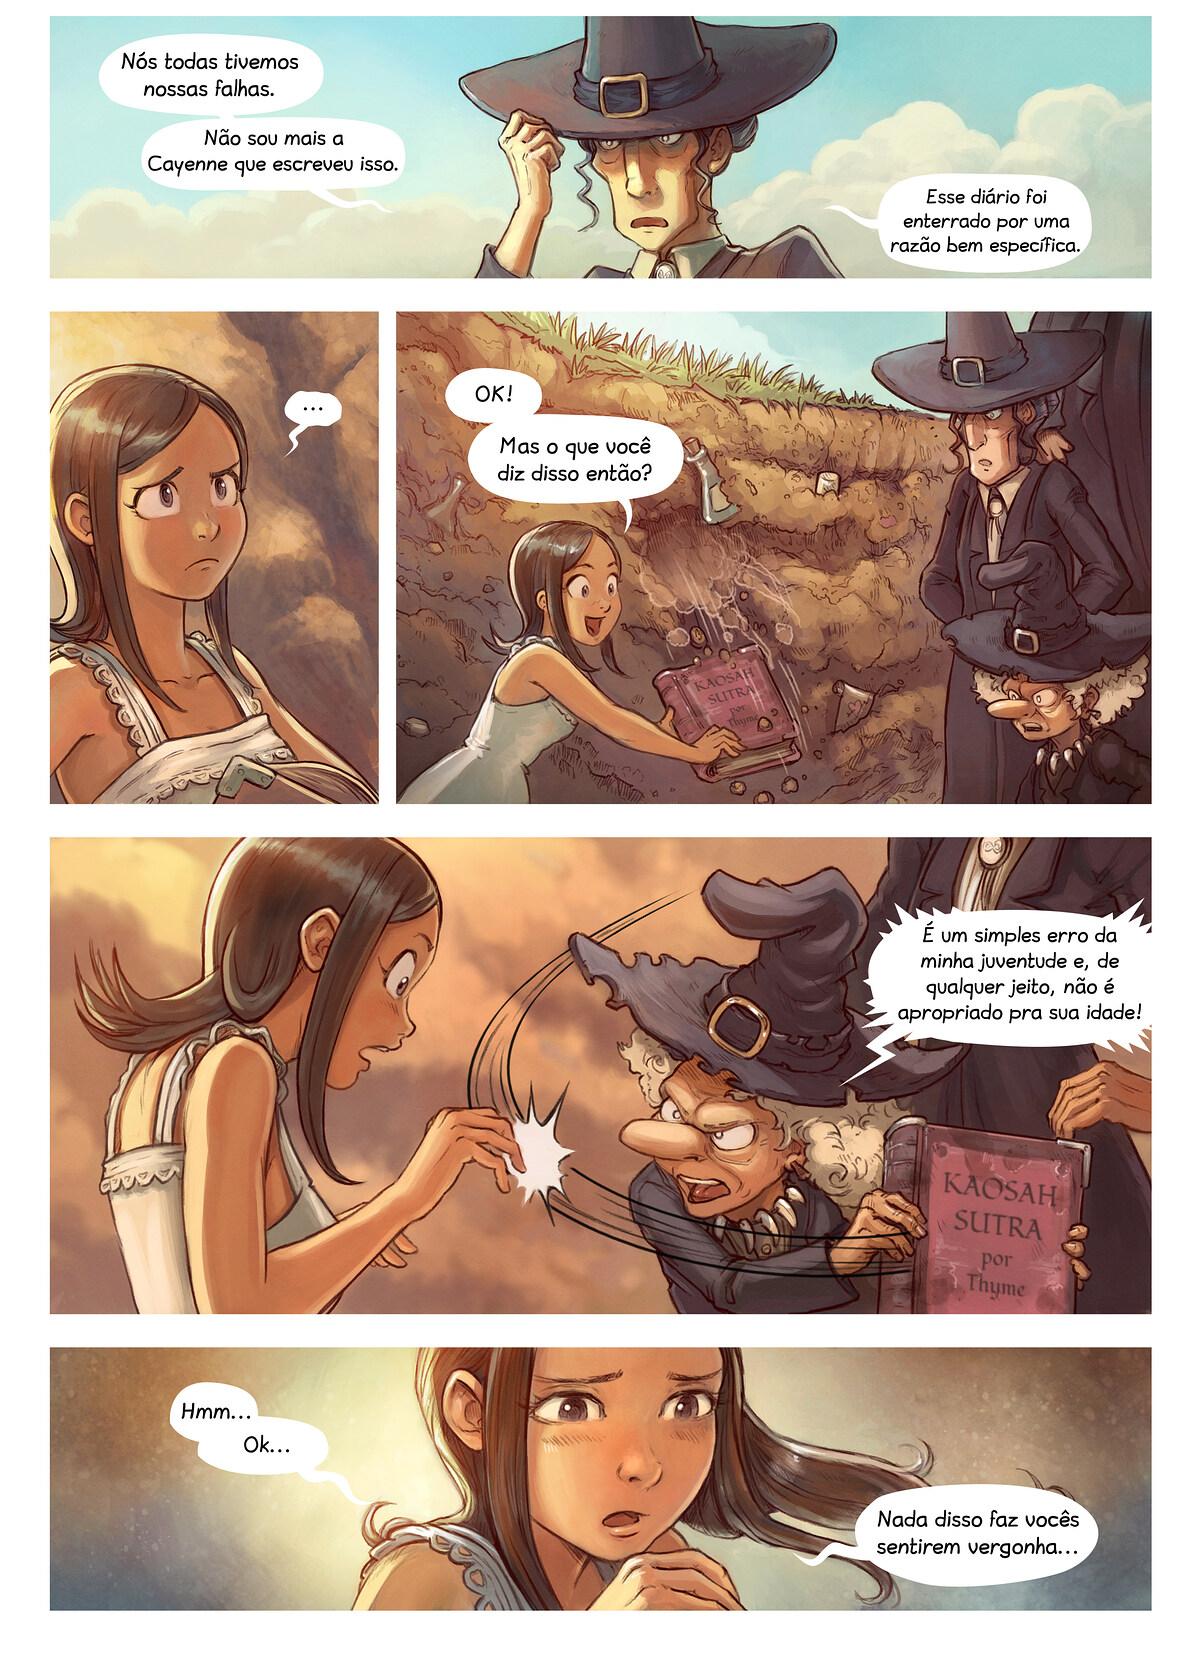 A webcomic page of Pepper&Carrot, episódio 19 [pt], página 5